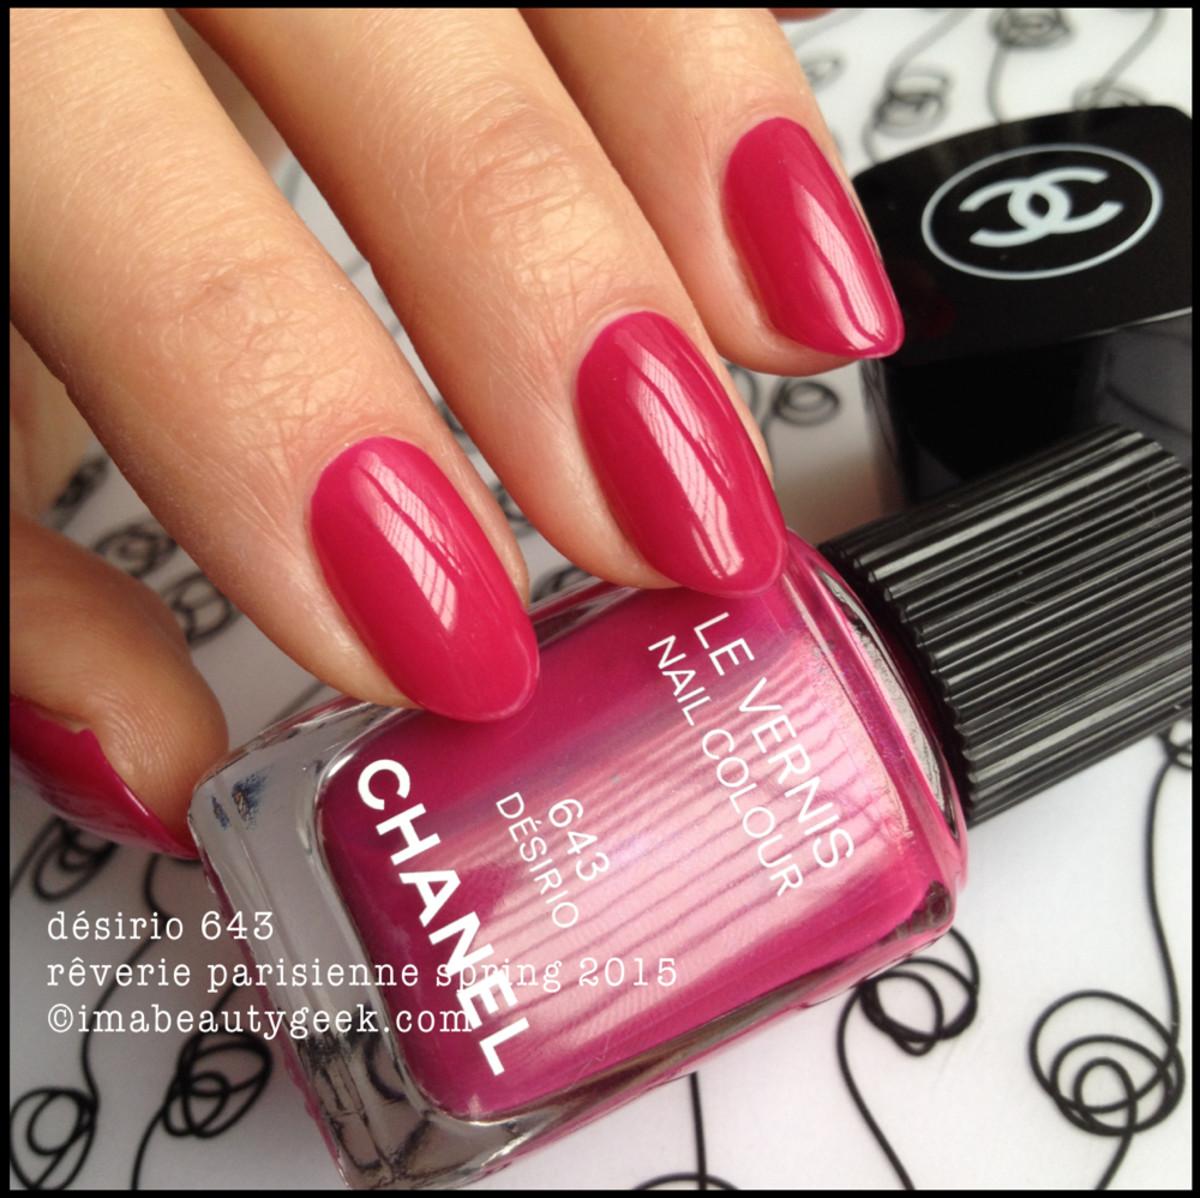 Chanel Desirio 643 Vernis Reverie Parisienne Spring 2015_1